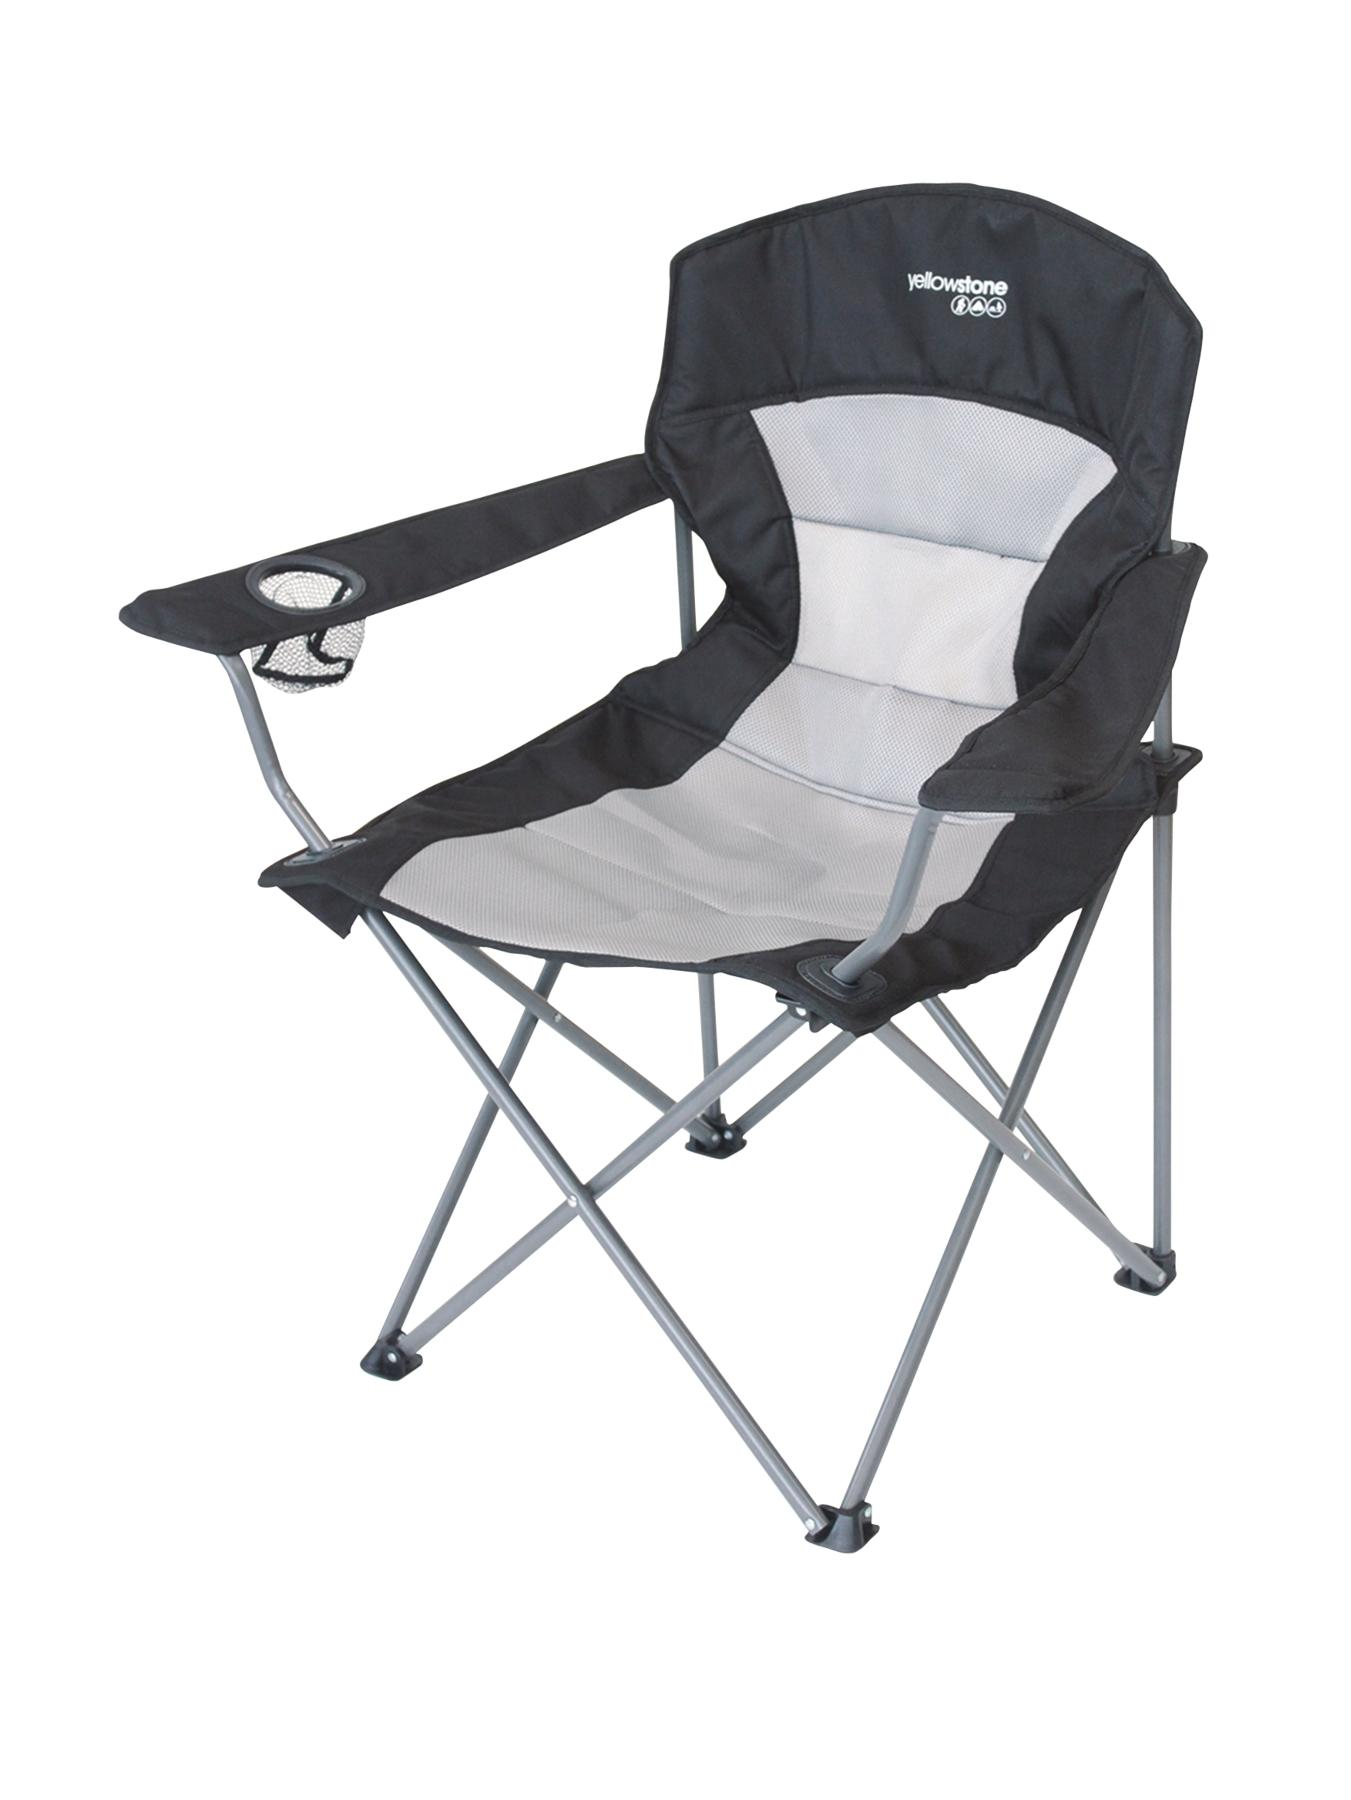 Ashford Exec Chair - Black